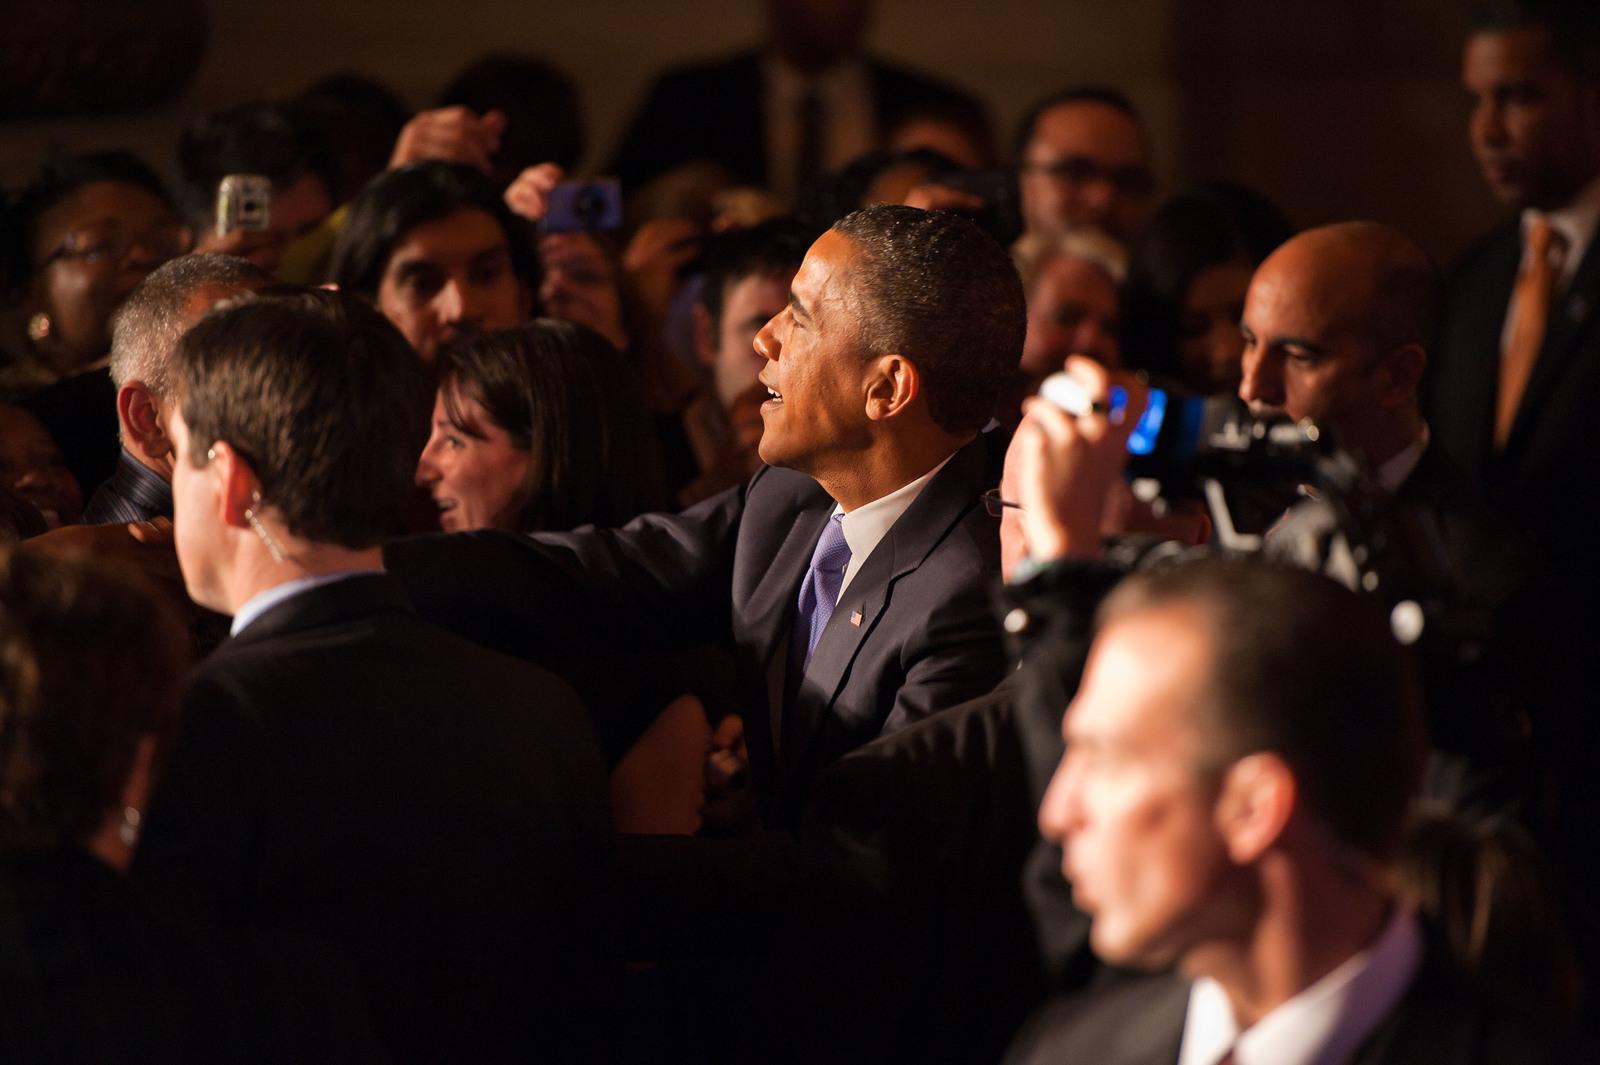 Office of the Administrator - President Obama [412-APD-1097-2012-12-10_PresidentObama_178.jpg]